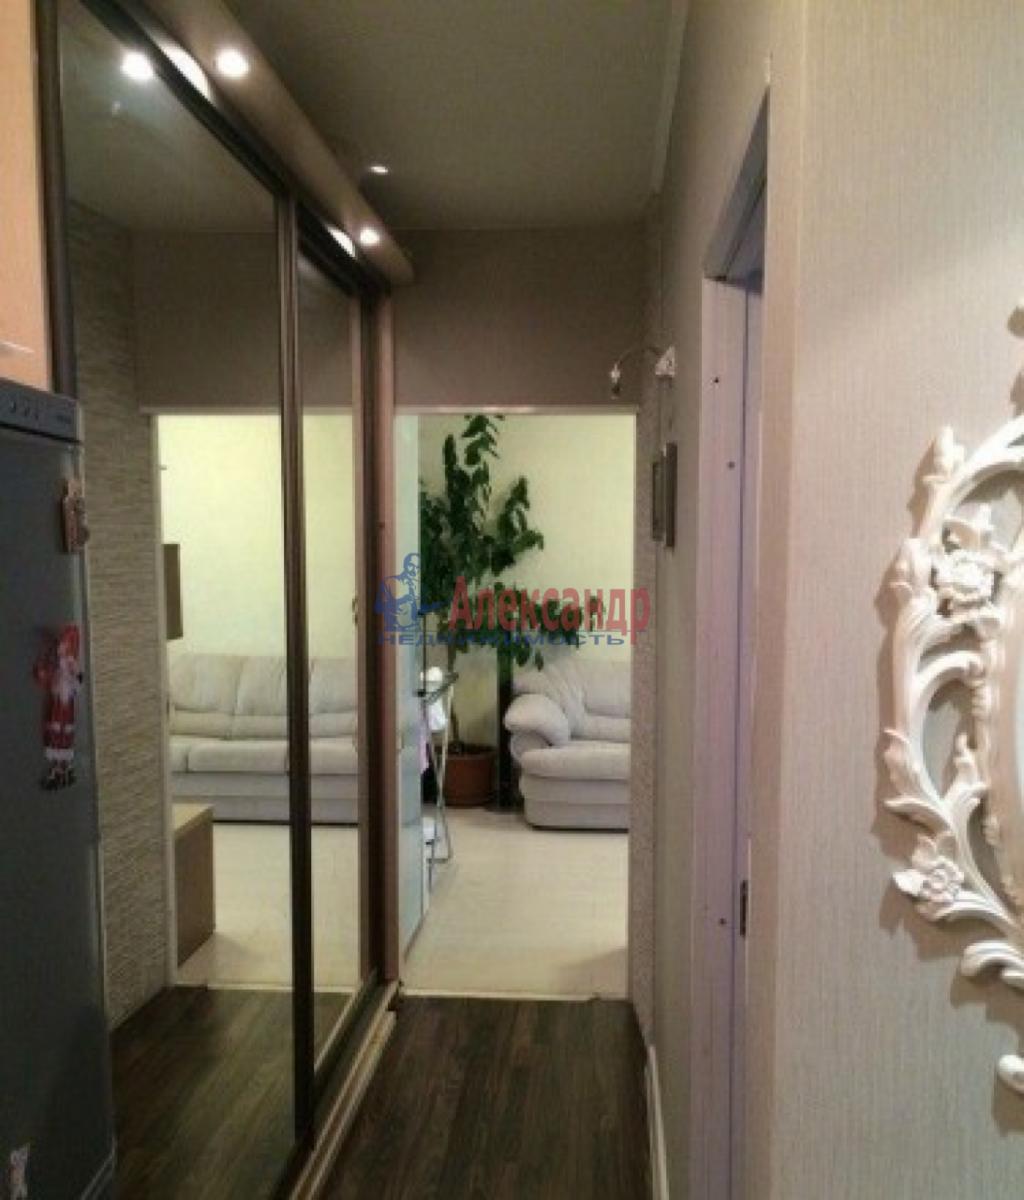 2-комнатная квартира (50м2) в аренду по адресу Ленинский пр., 176— фото 1 из 9